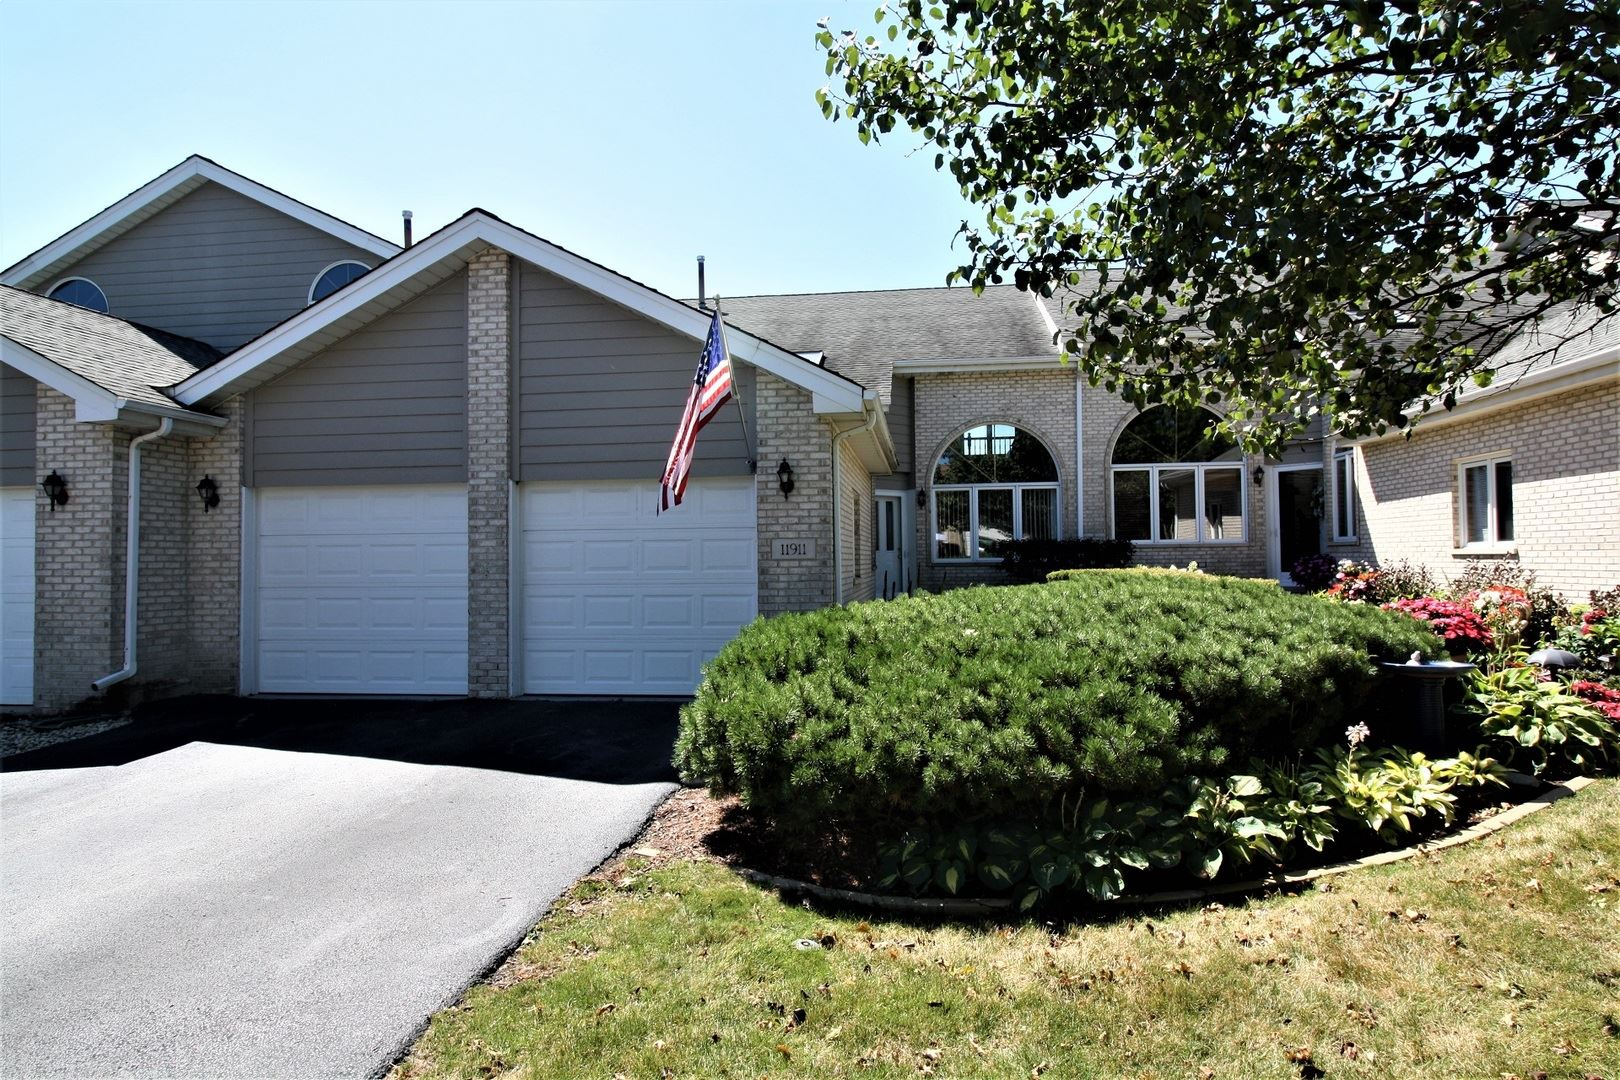 11911 Cormoy Lane, Orland Park, IL 60467 - #: 10816250